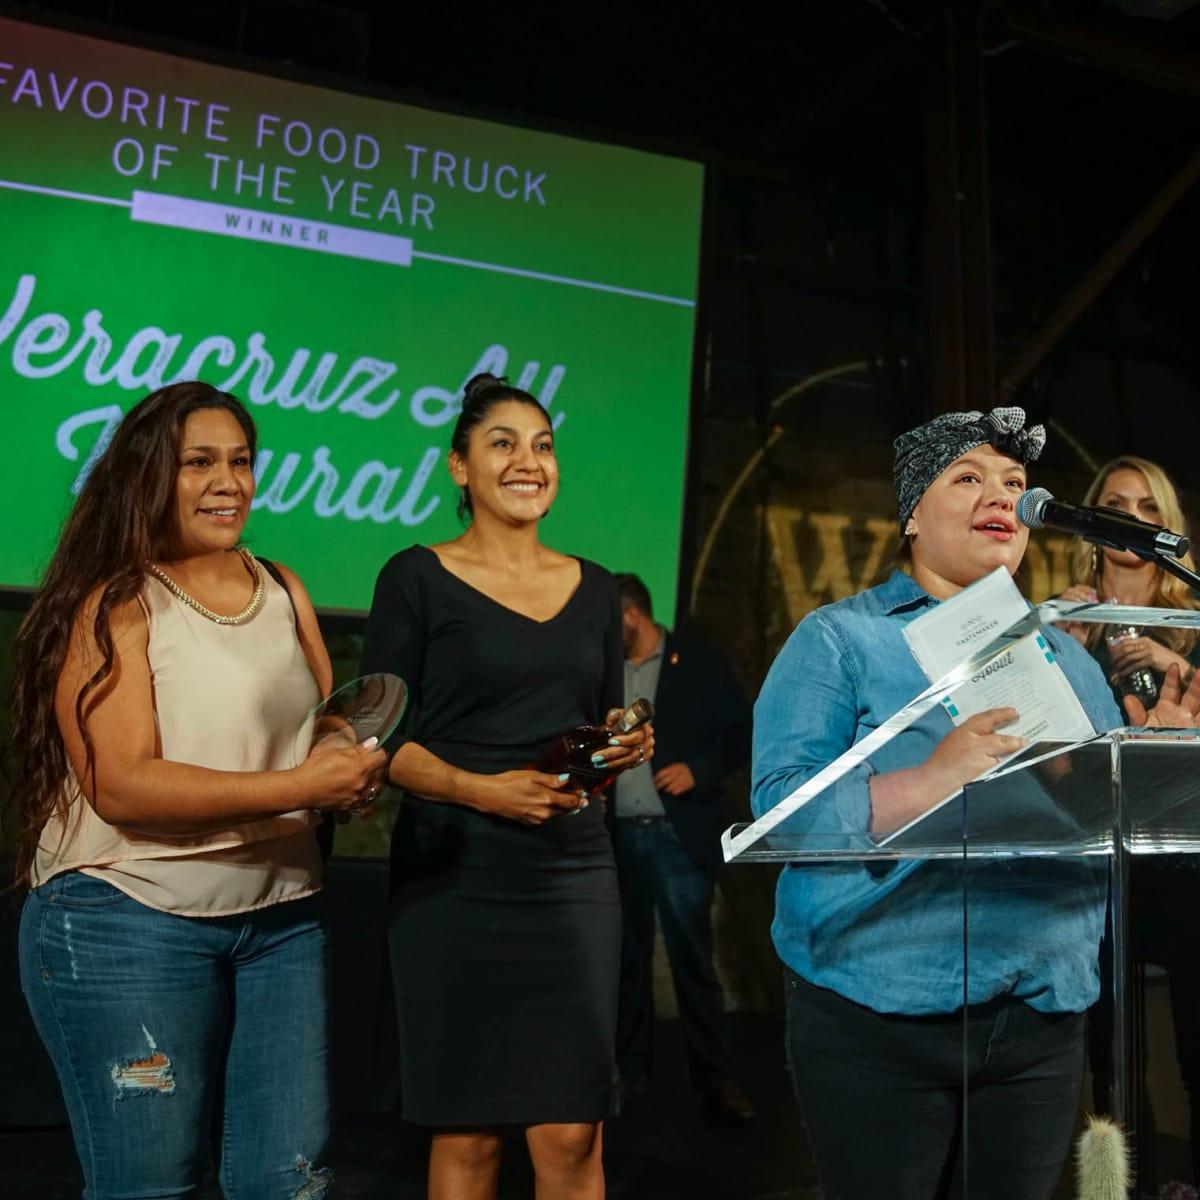 CultureMap Austin 2018 Tastemaker Awards at Fair Market Favorite Food Truck of the Year Veracruz All Natural